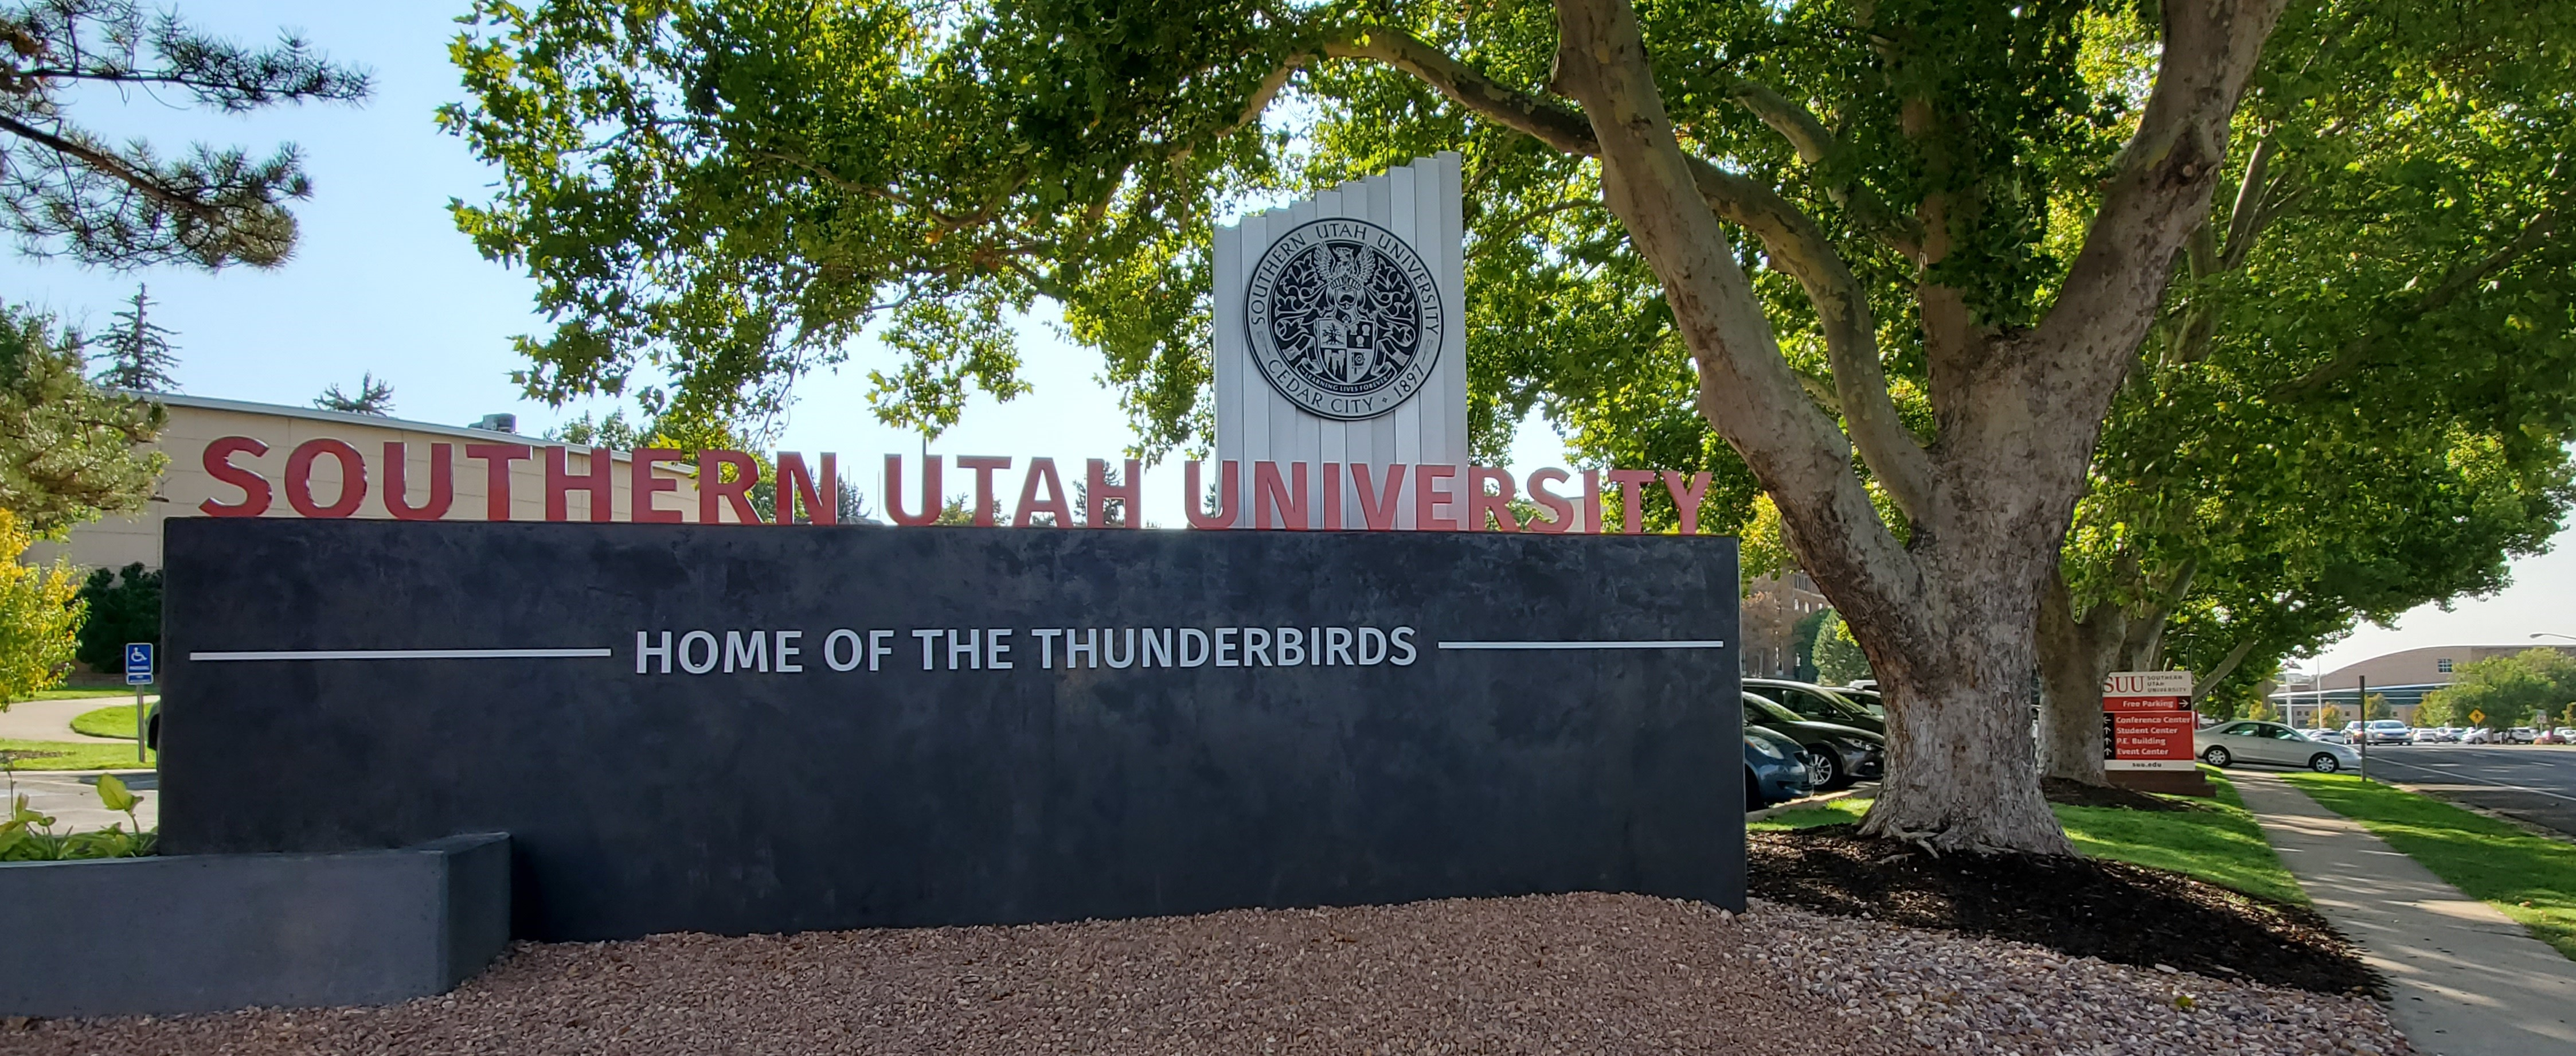 Southern Utah University sign